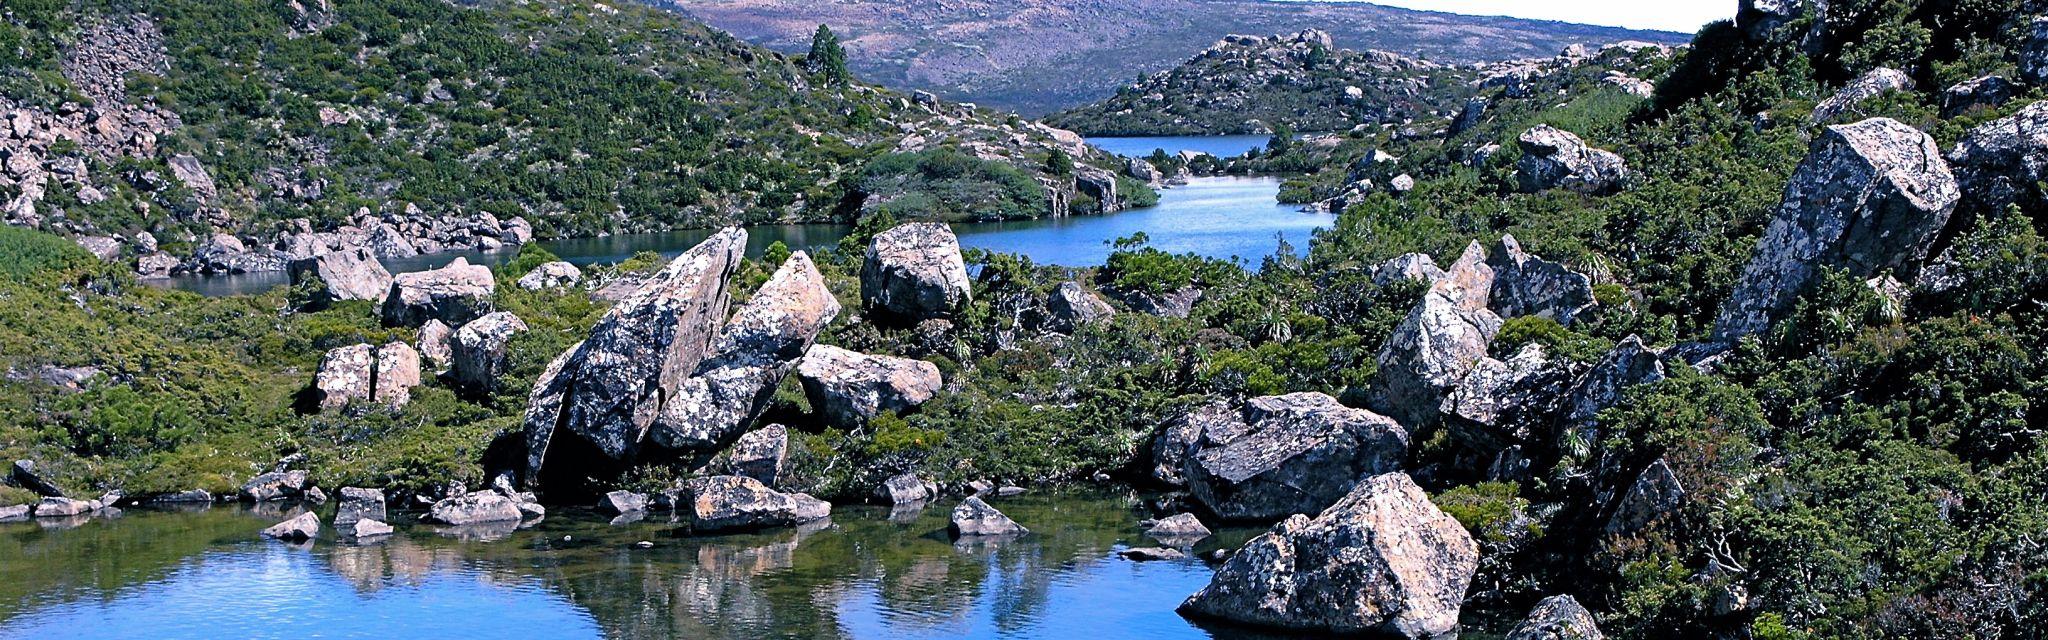 Beautiful Tarn Shelf Mt Field National Park on Nature Bound Australia tour